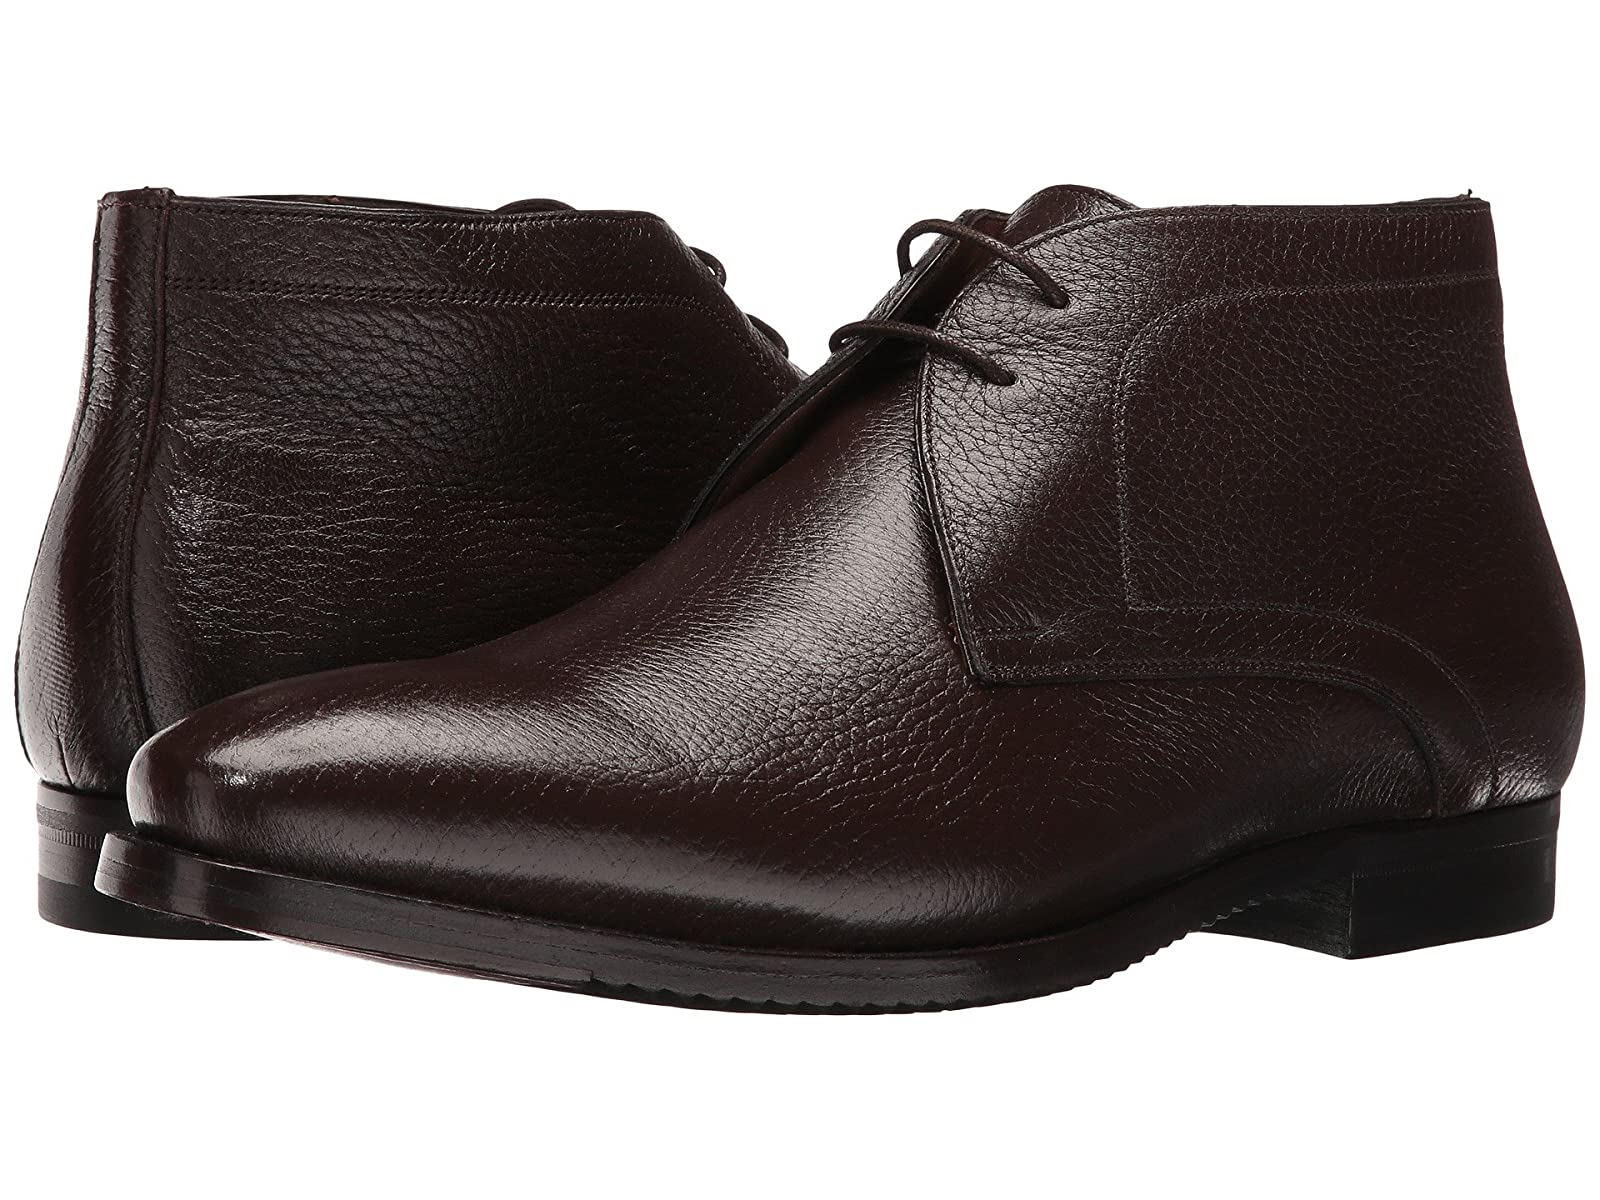 Mezlan UsiniCheap and distinctive eye-catching shoes